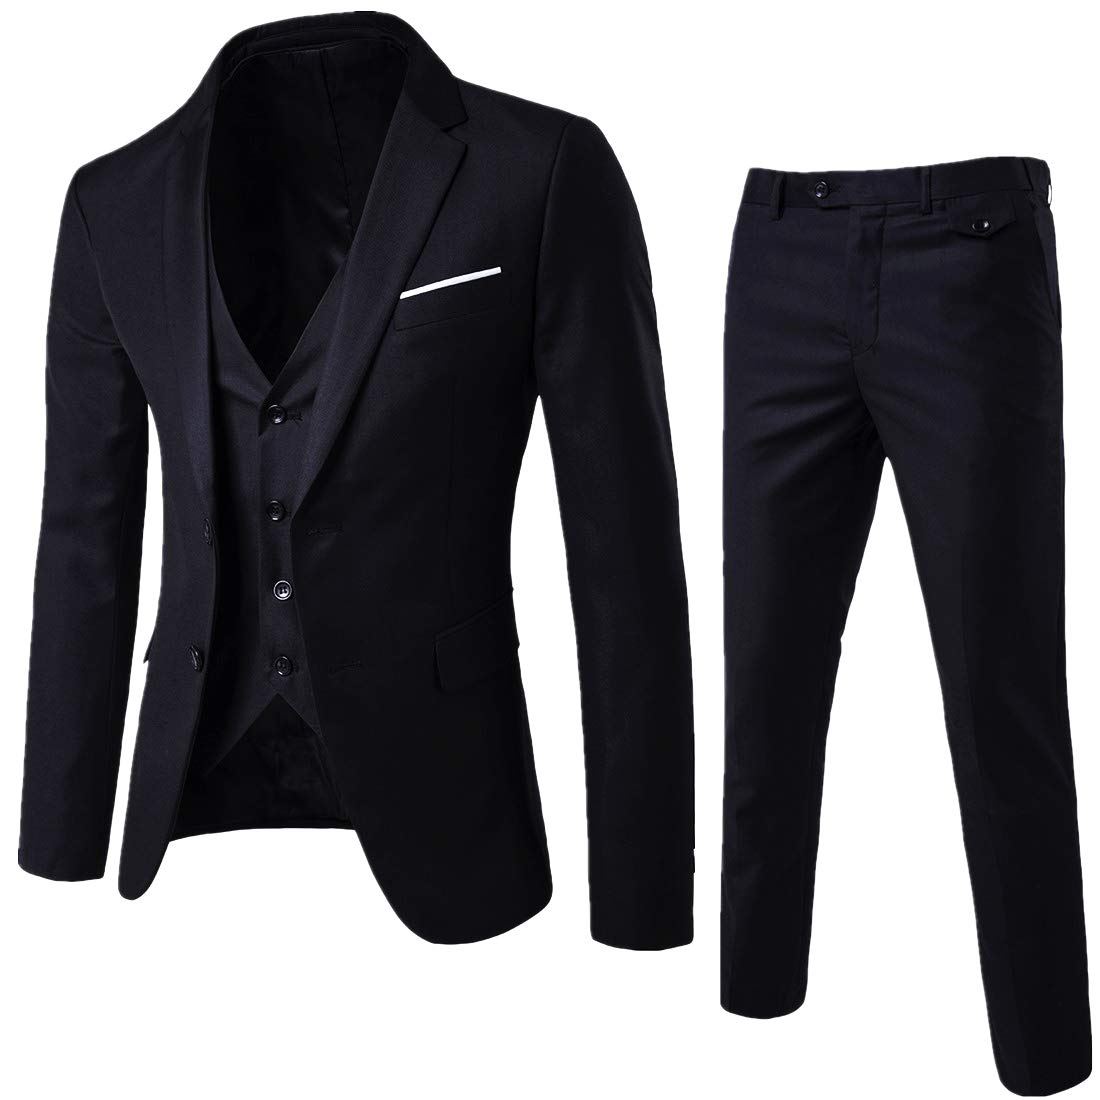 YIMANIE Mens Suit 3 Piece Single Breasted Jacket Two Button Slim Fit Blazer Tux Vest&Trousers, Black, Medium